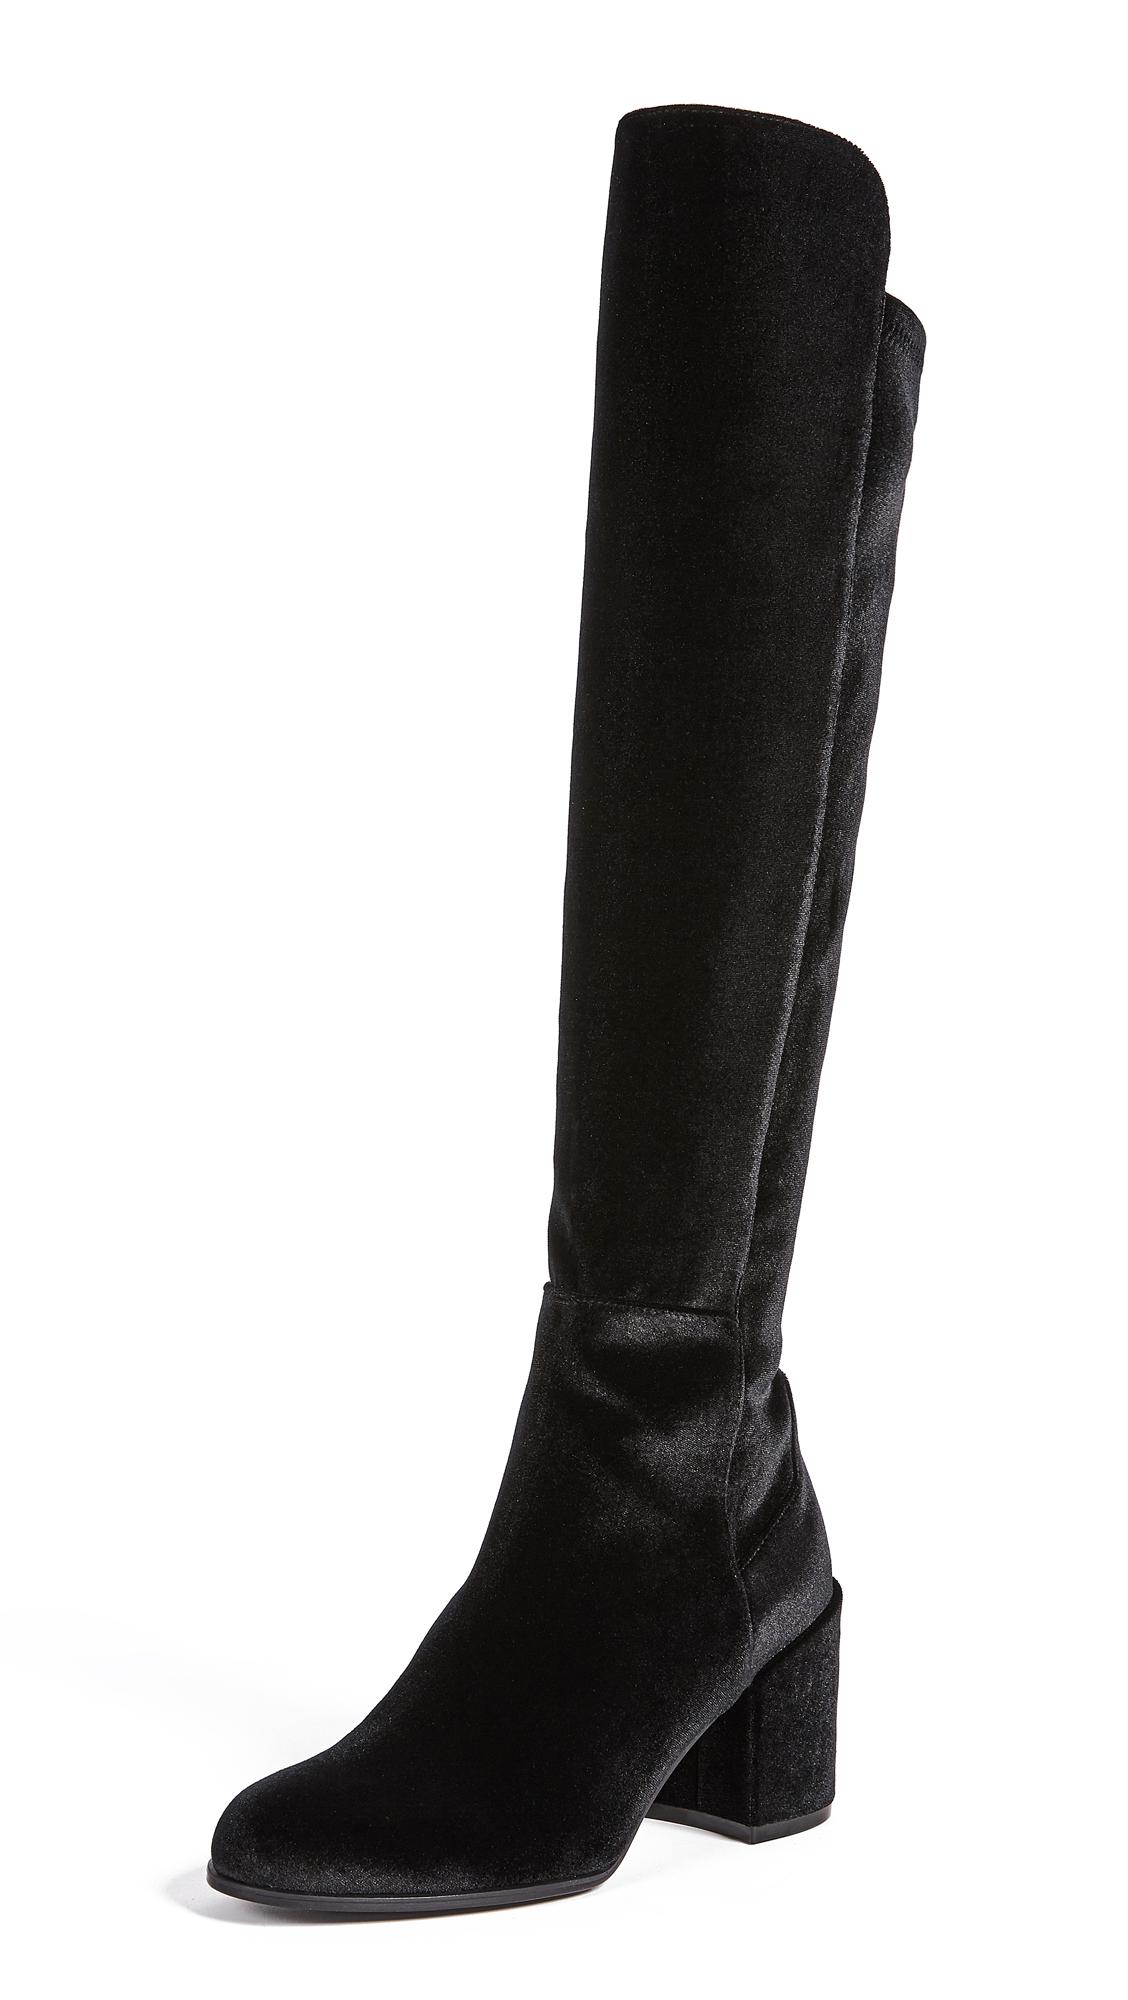 Stuart Weitzman Lowjack Boots - Nero